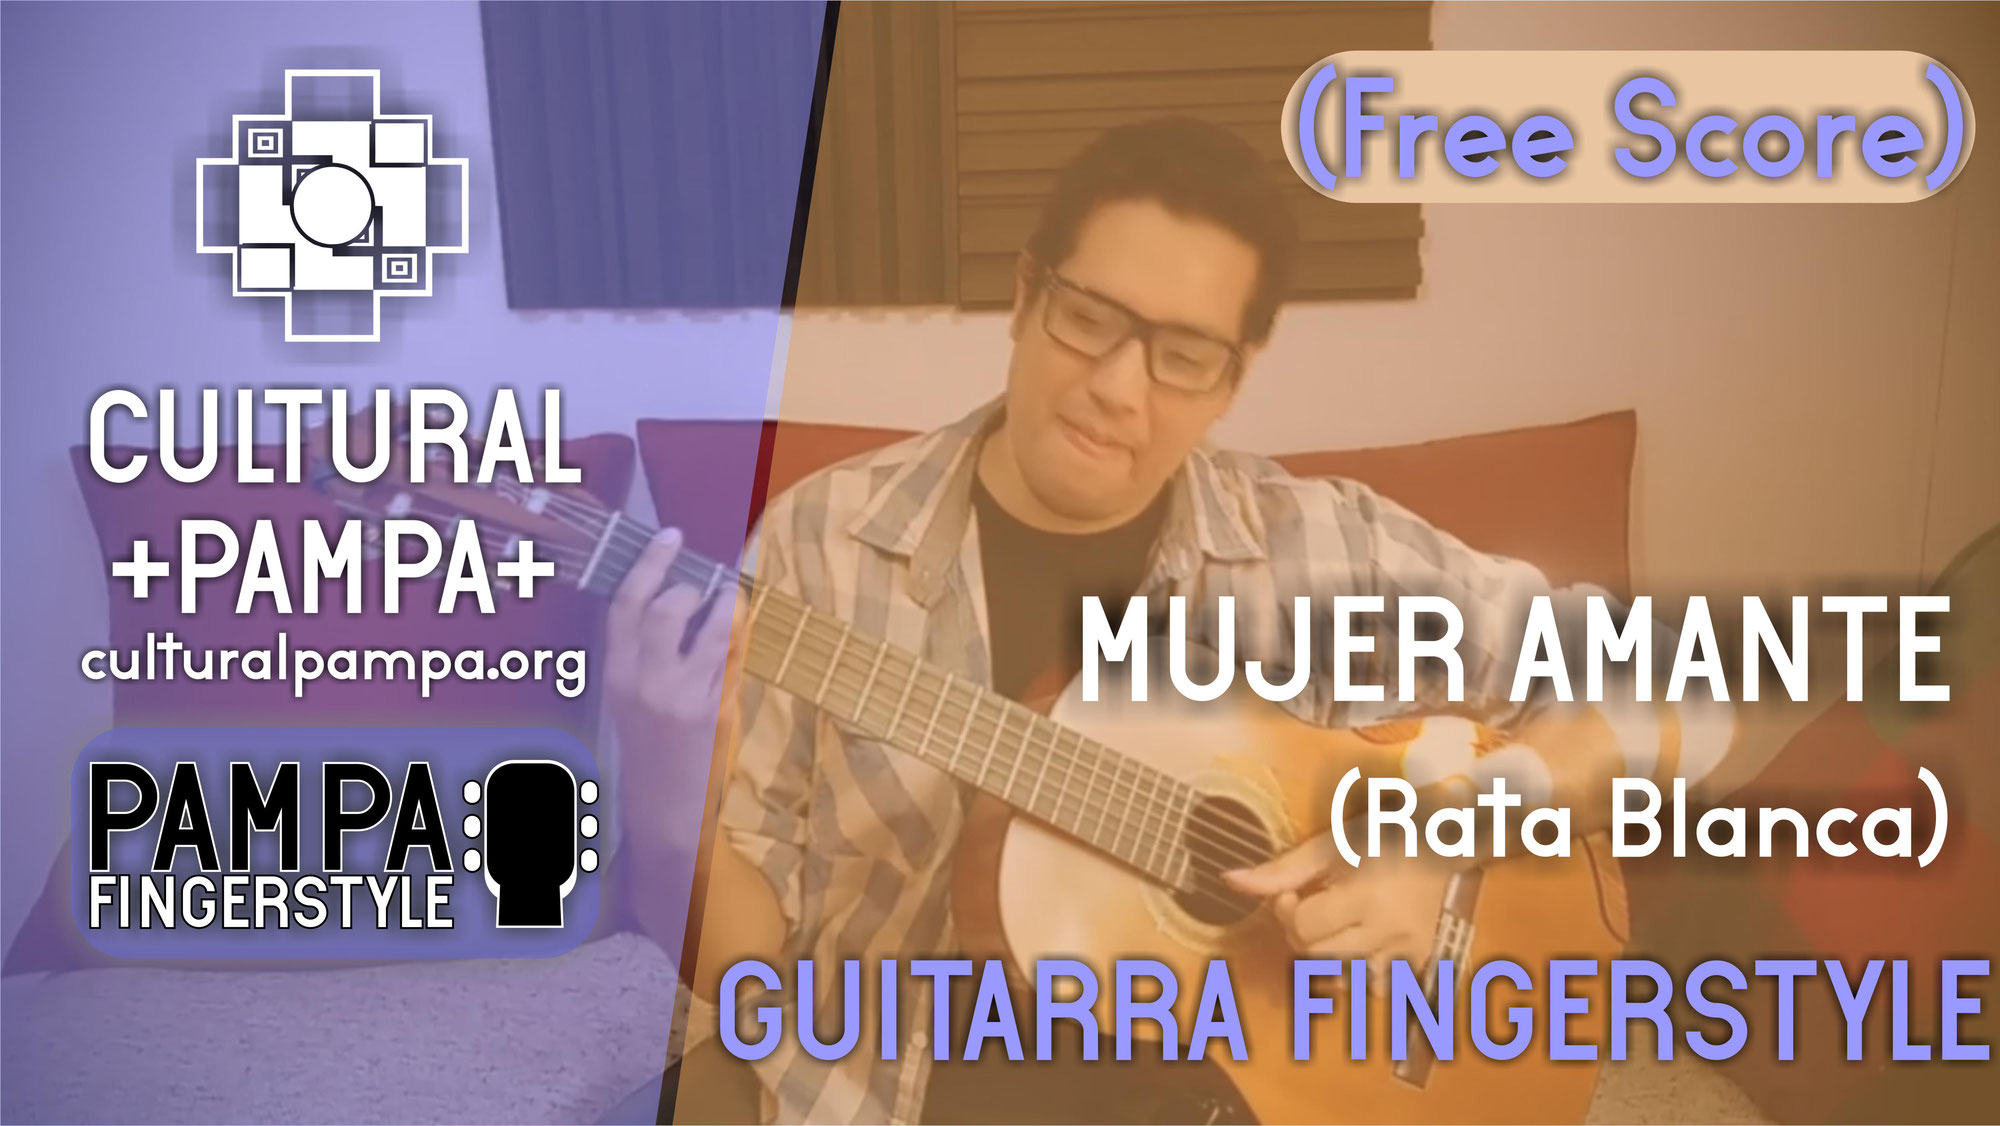 Mujer Amante (Rata Blanca) | Guitarra Fingerstyle